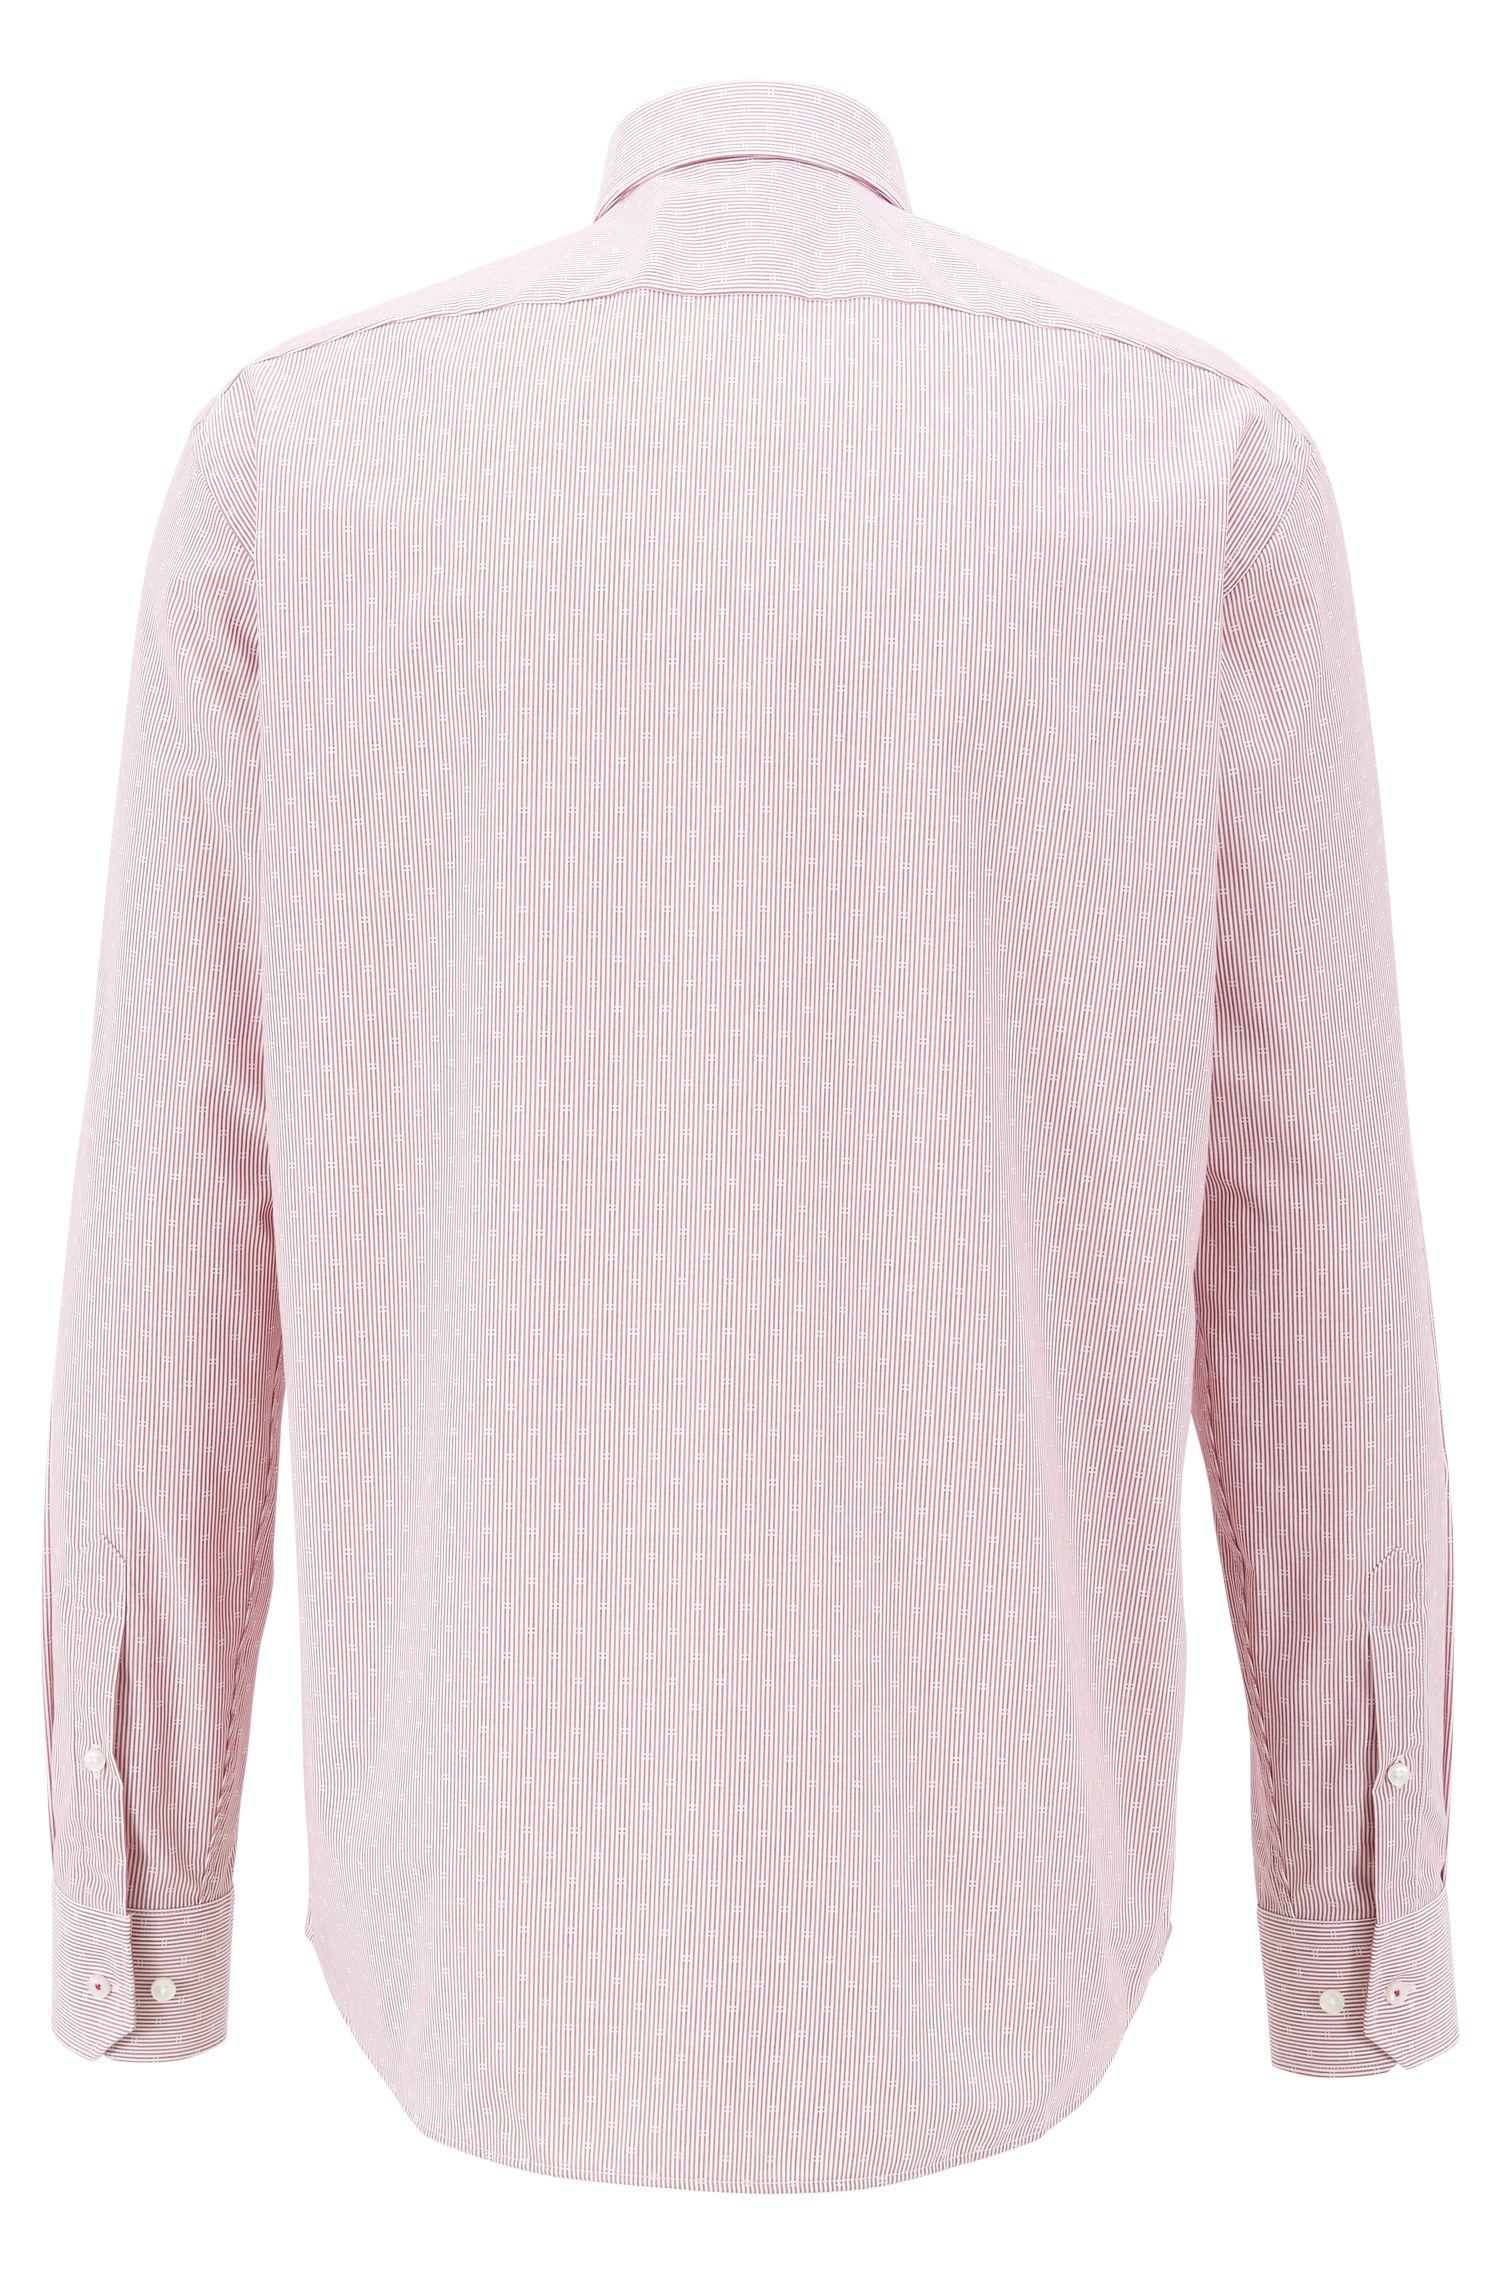 Camisa regular fit en popelín de algodón dobby de planchado fácil, Rojo oscuro